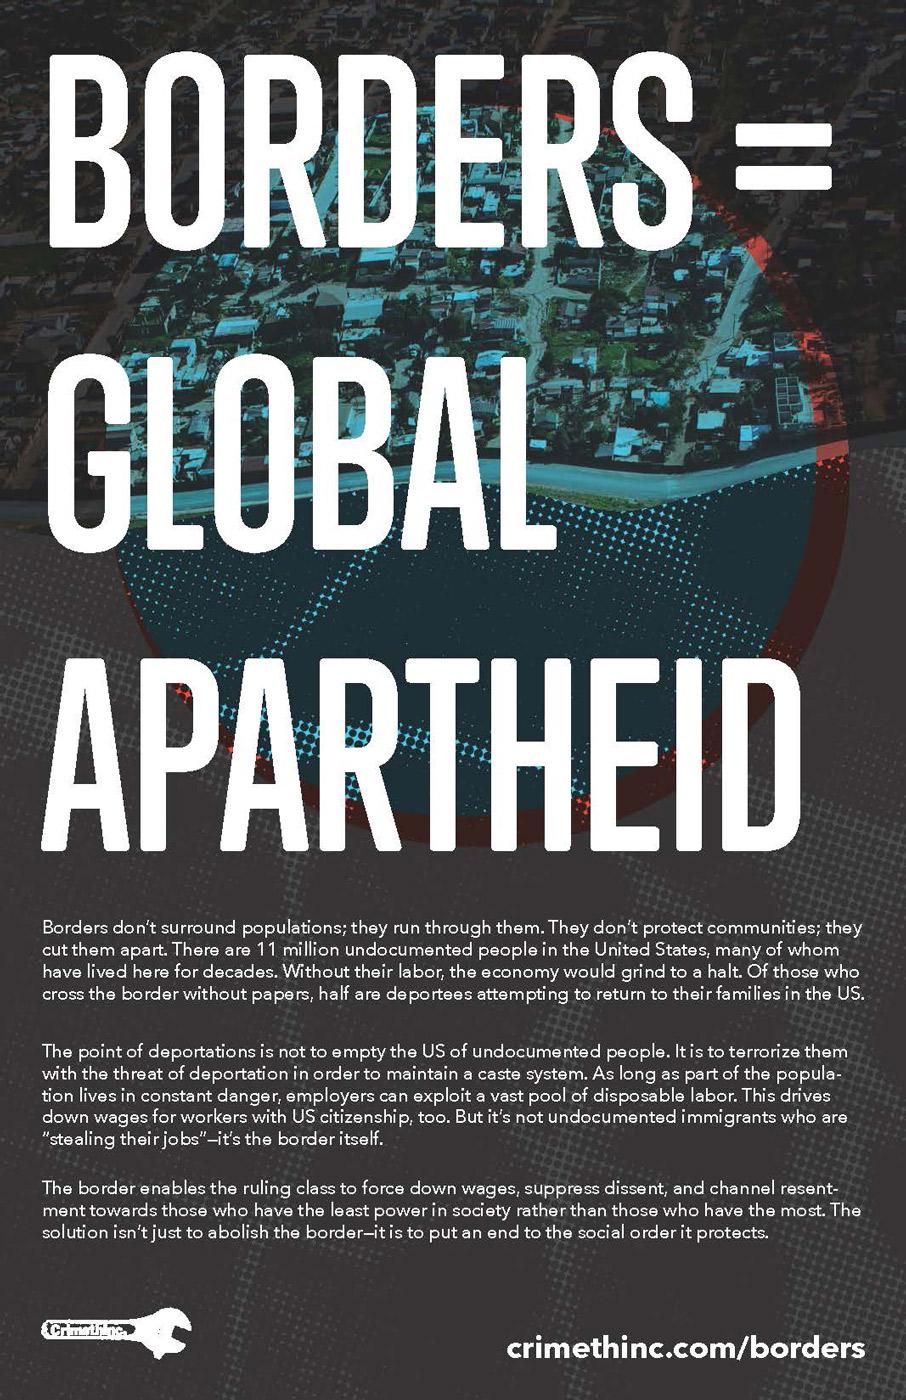 borders-equal-global-apartheid_front_color.jpg